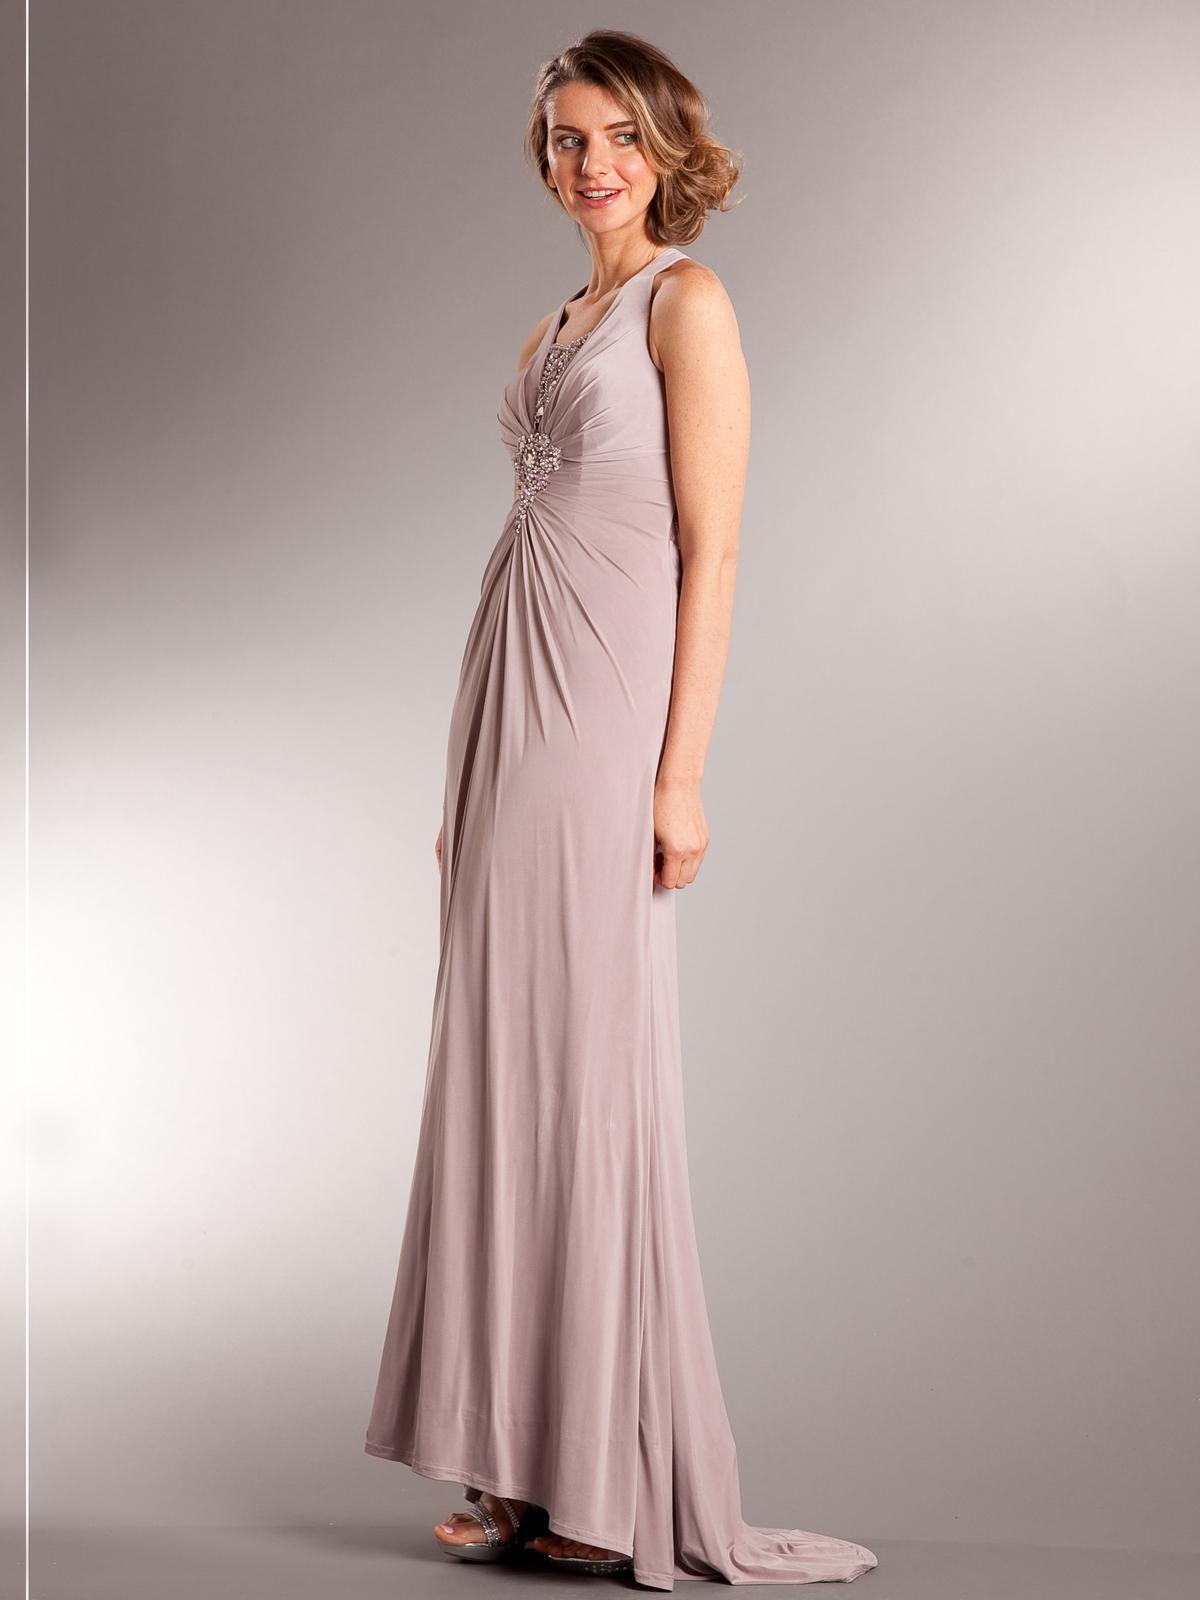 Wholesale Evening Dresses In Los Angeles - Formal Dresses